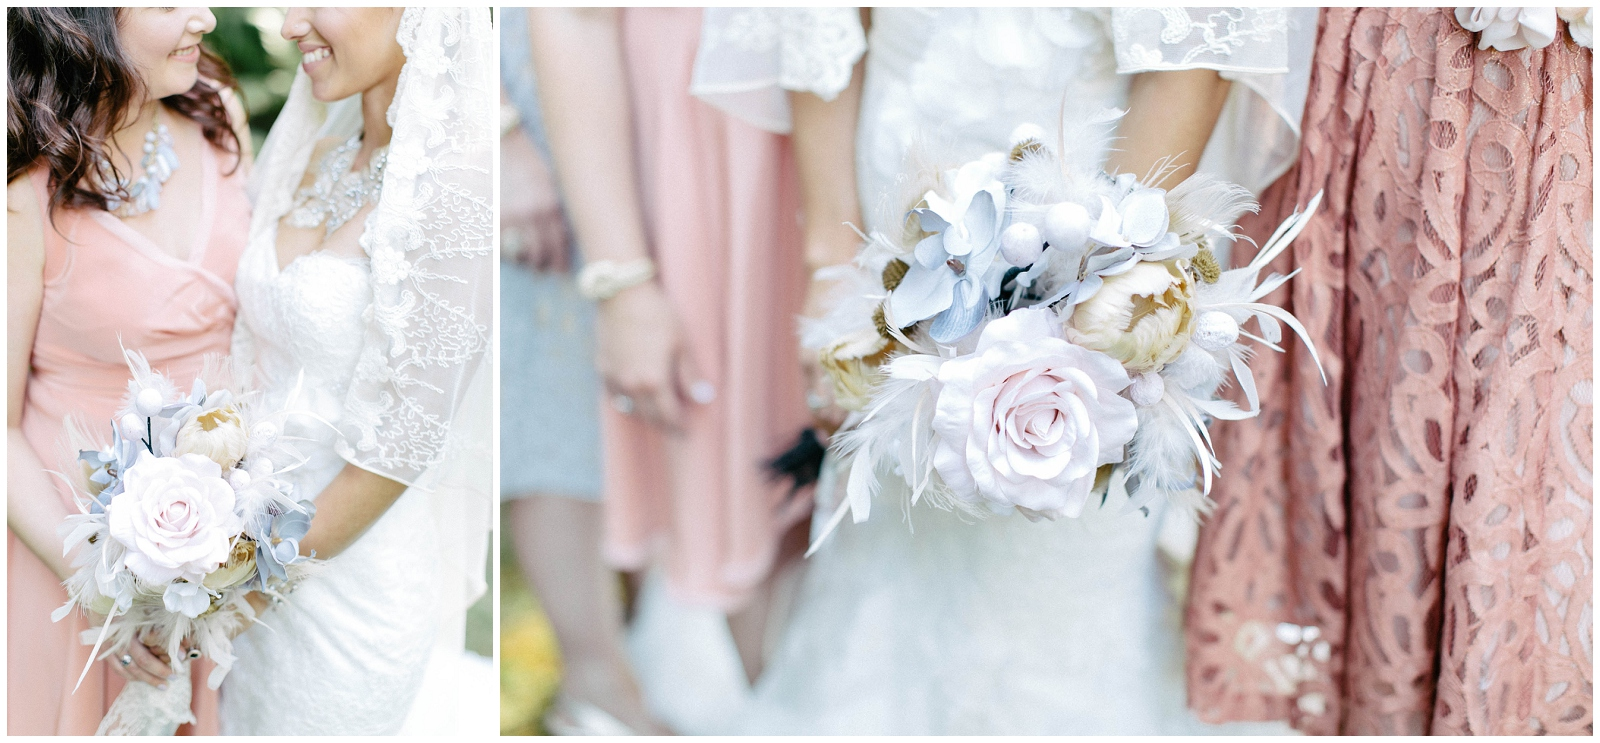 San-Francisco-Bay-Area-Wedding-Photography_Nestle_Down_16.jpg